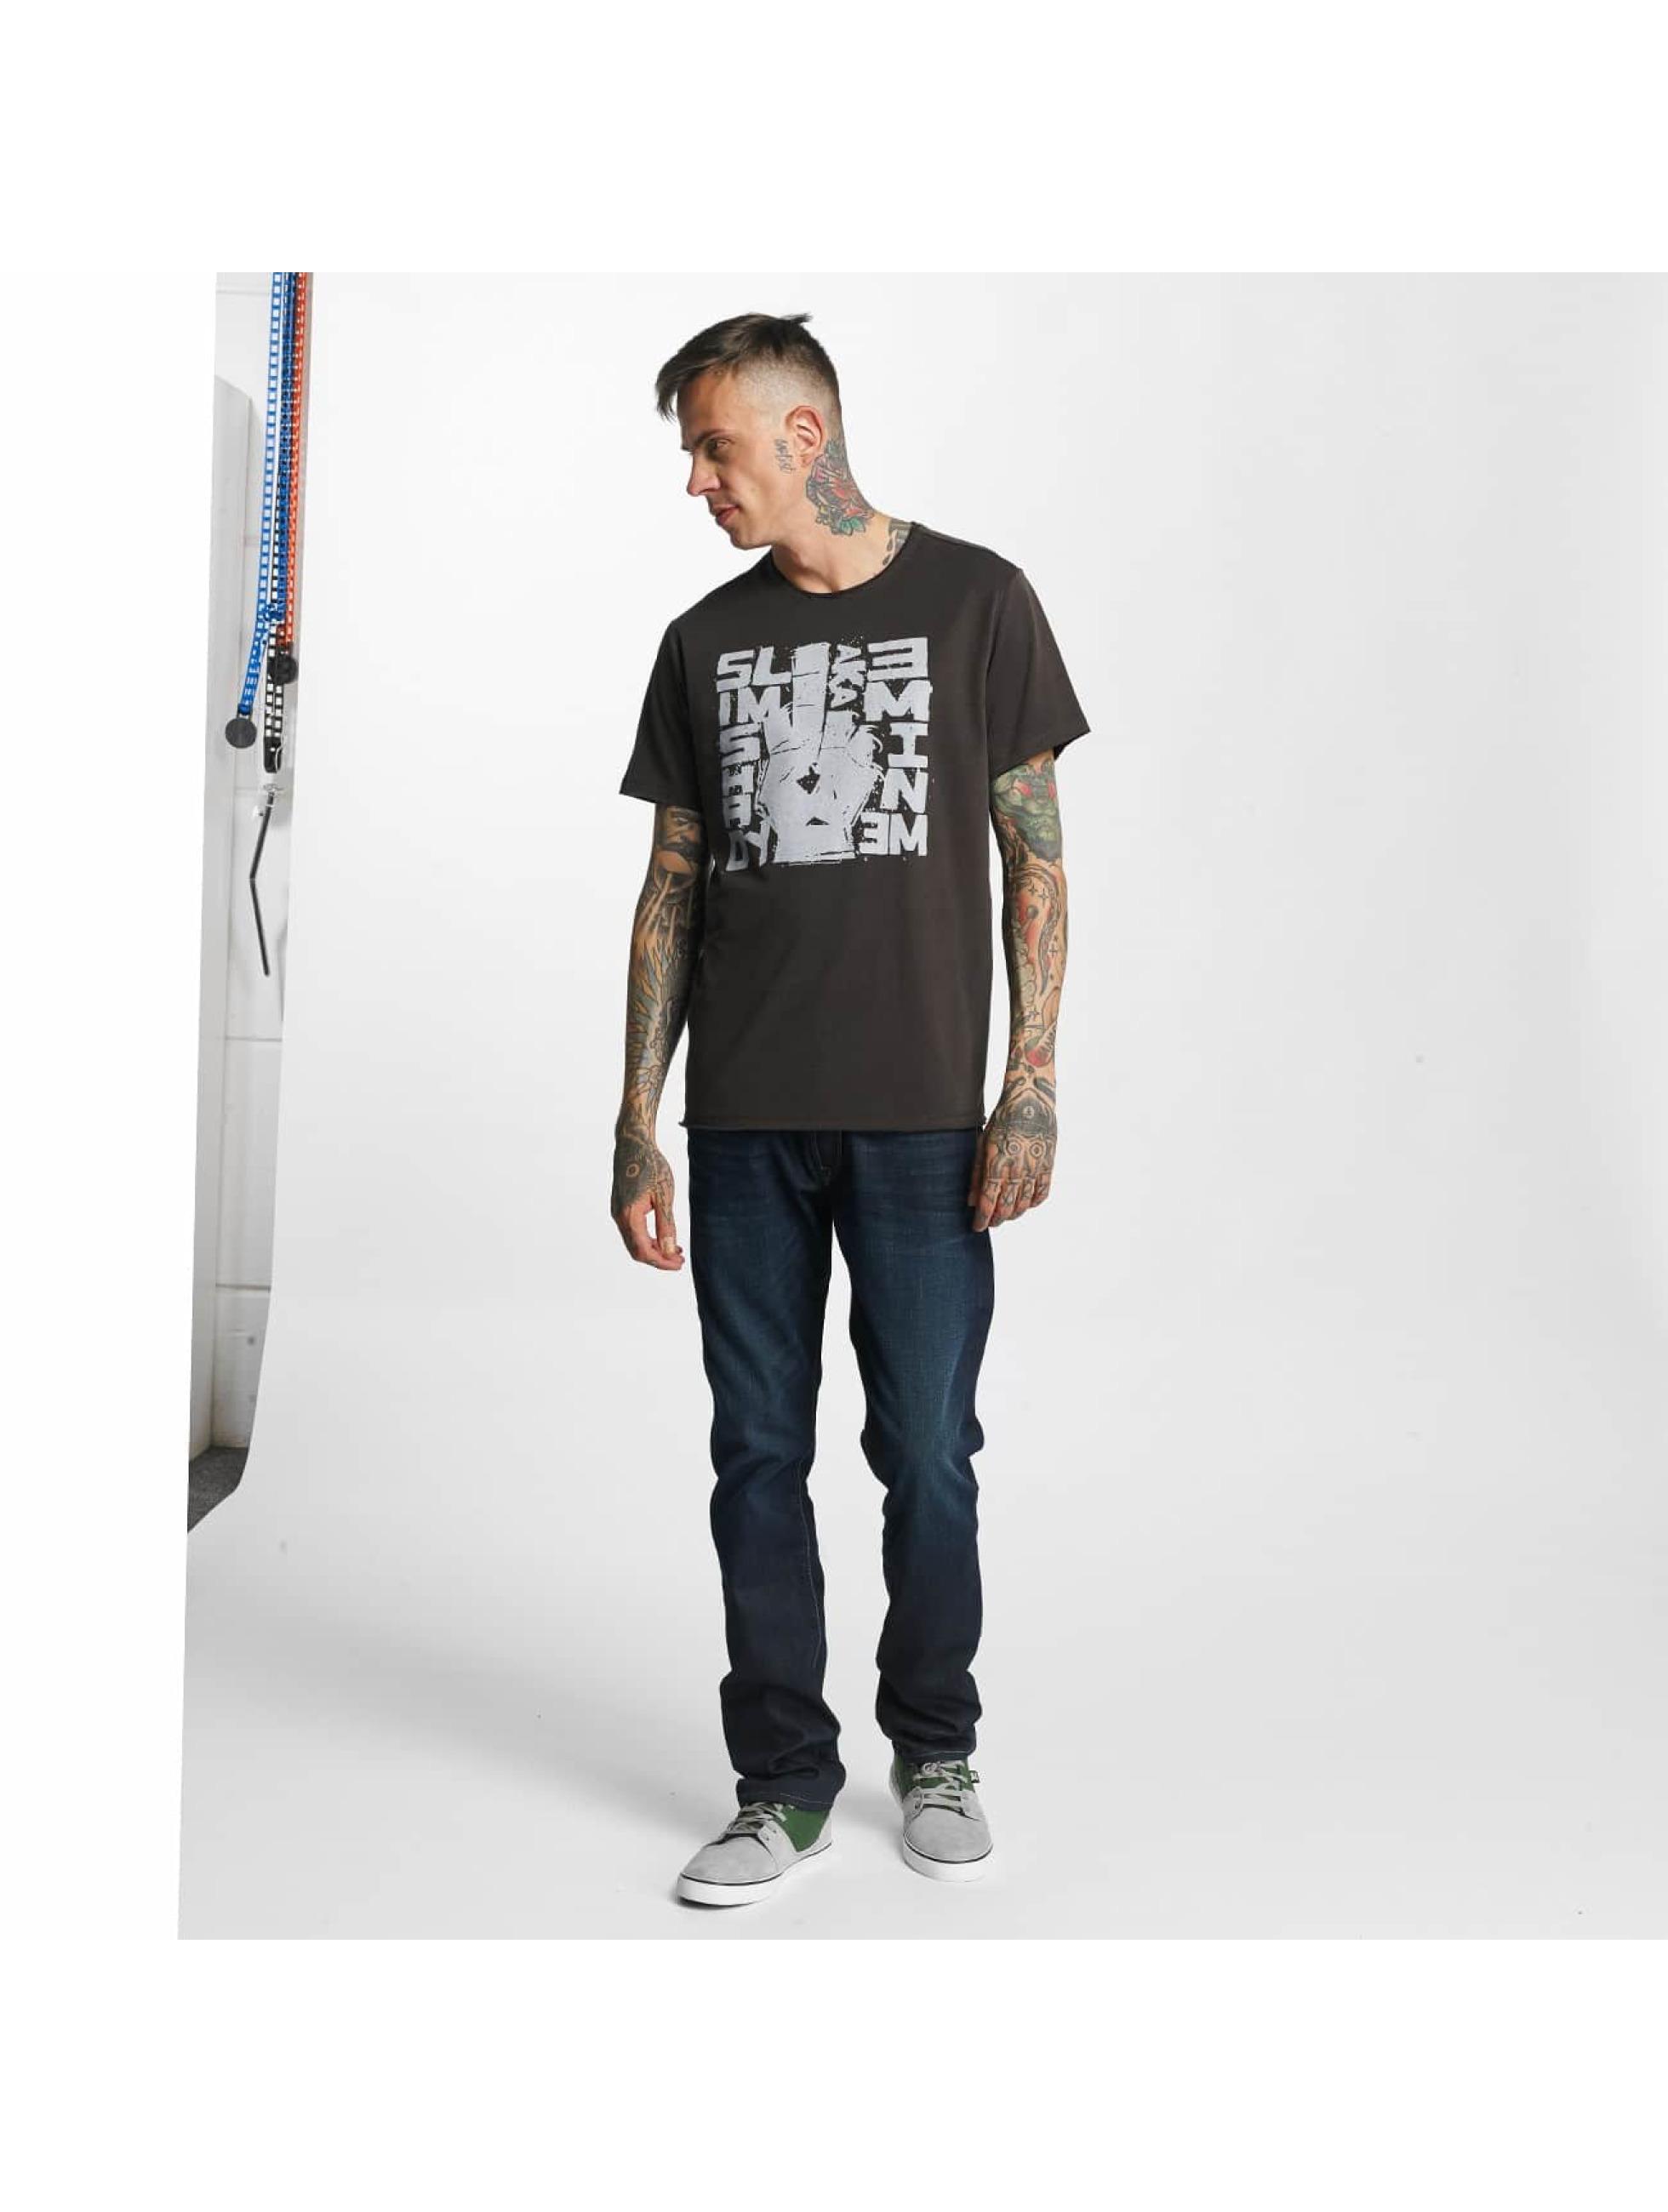 Amplified T-Shirt Eminem Slim Shady gray